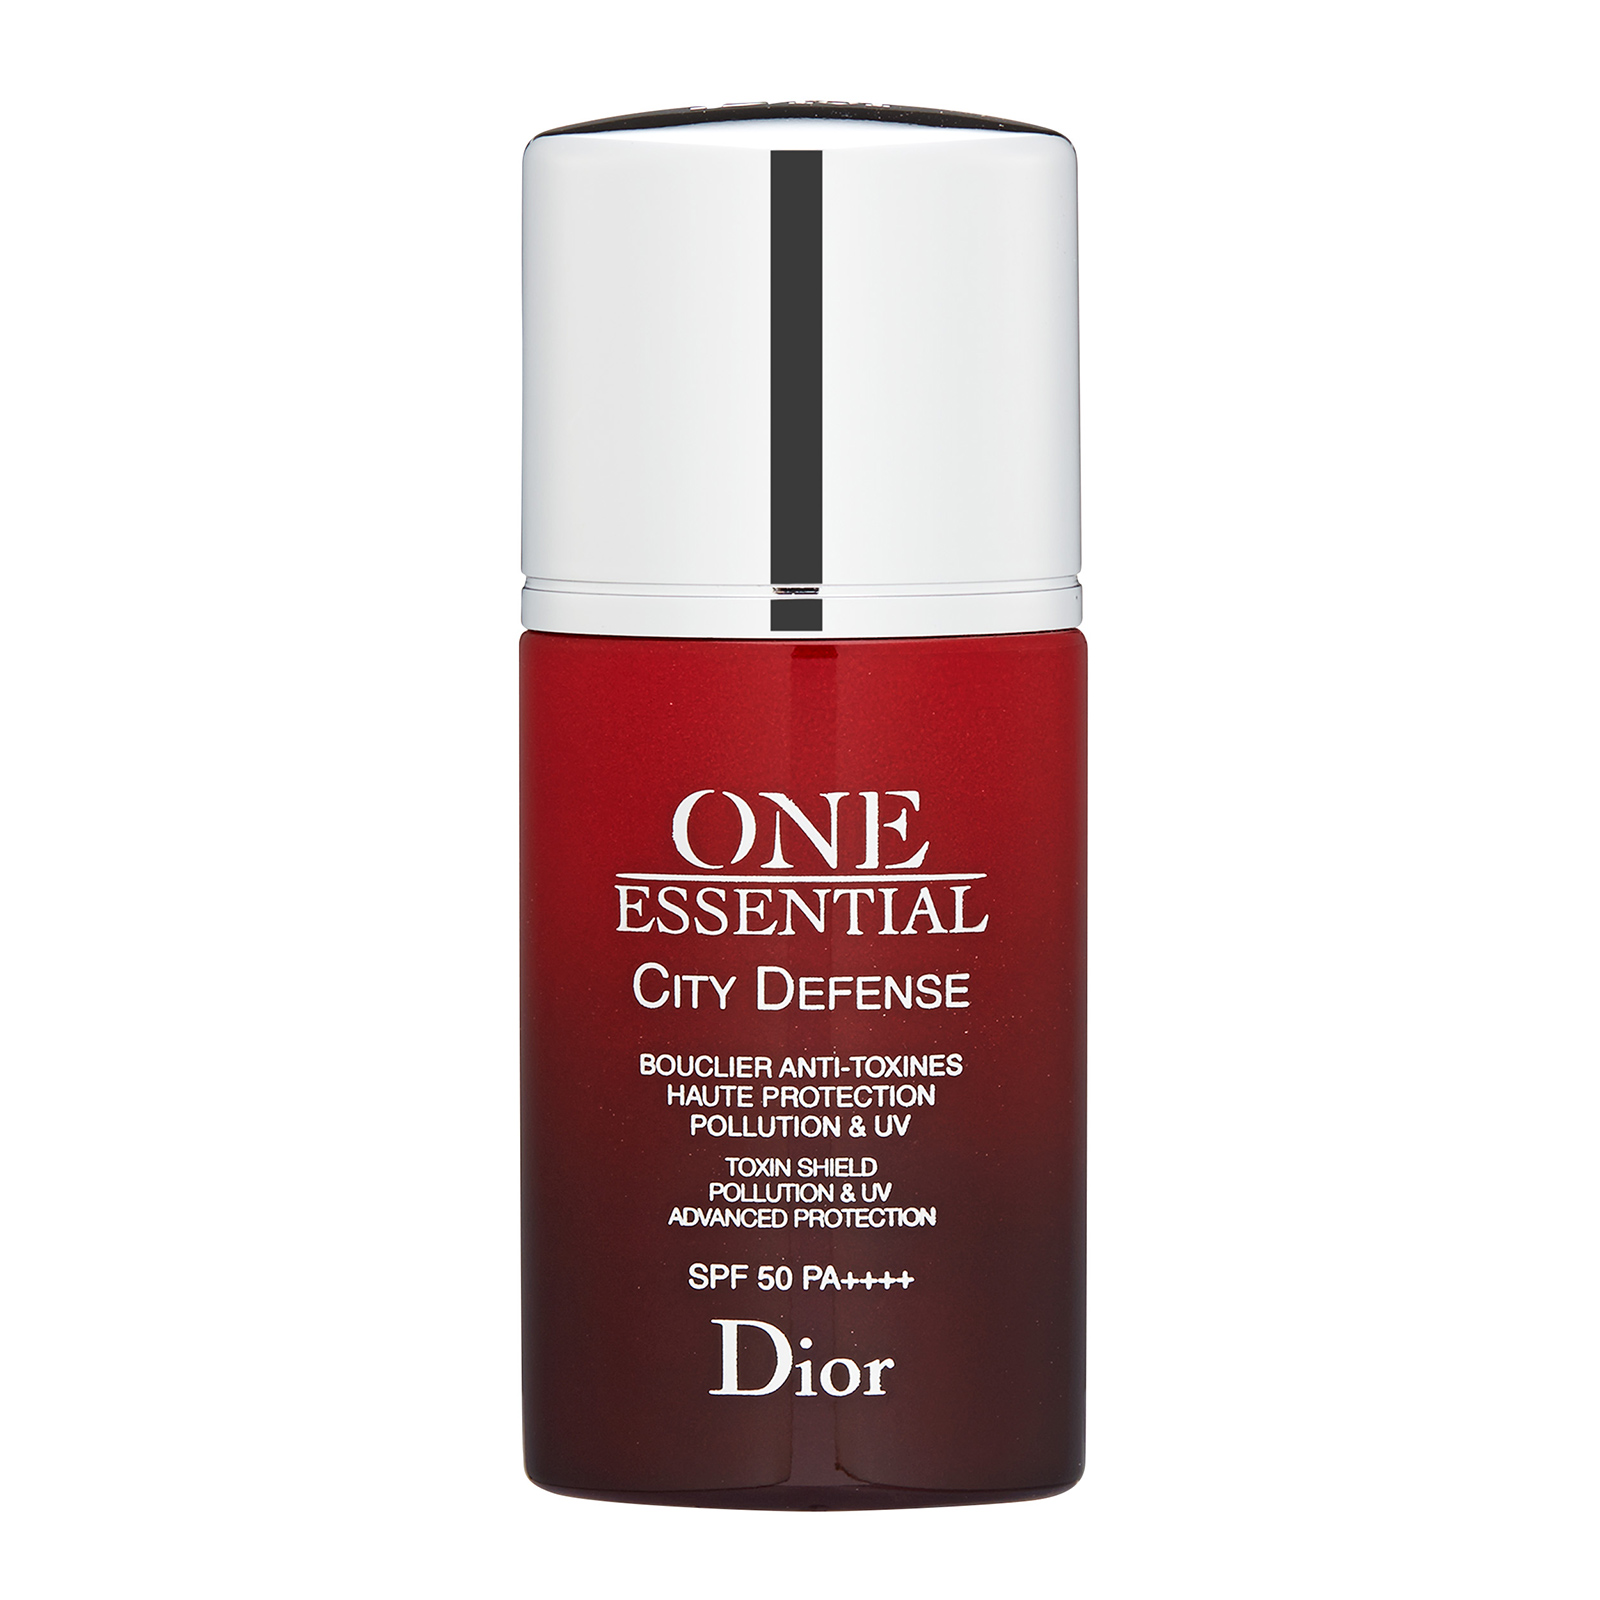 Christian Dior One Essential City Defense Toxin Shield Pollution & UV Advanced Protection SPF50 / PA++++ 1oz, 30ml